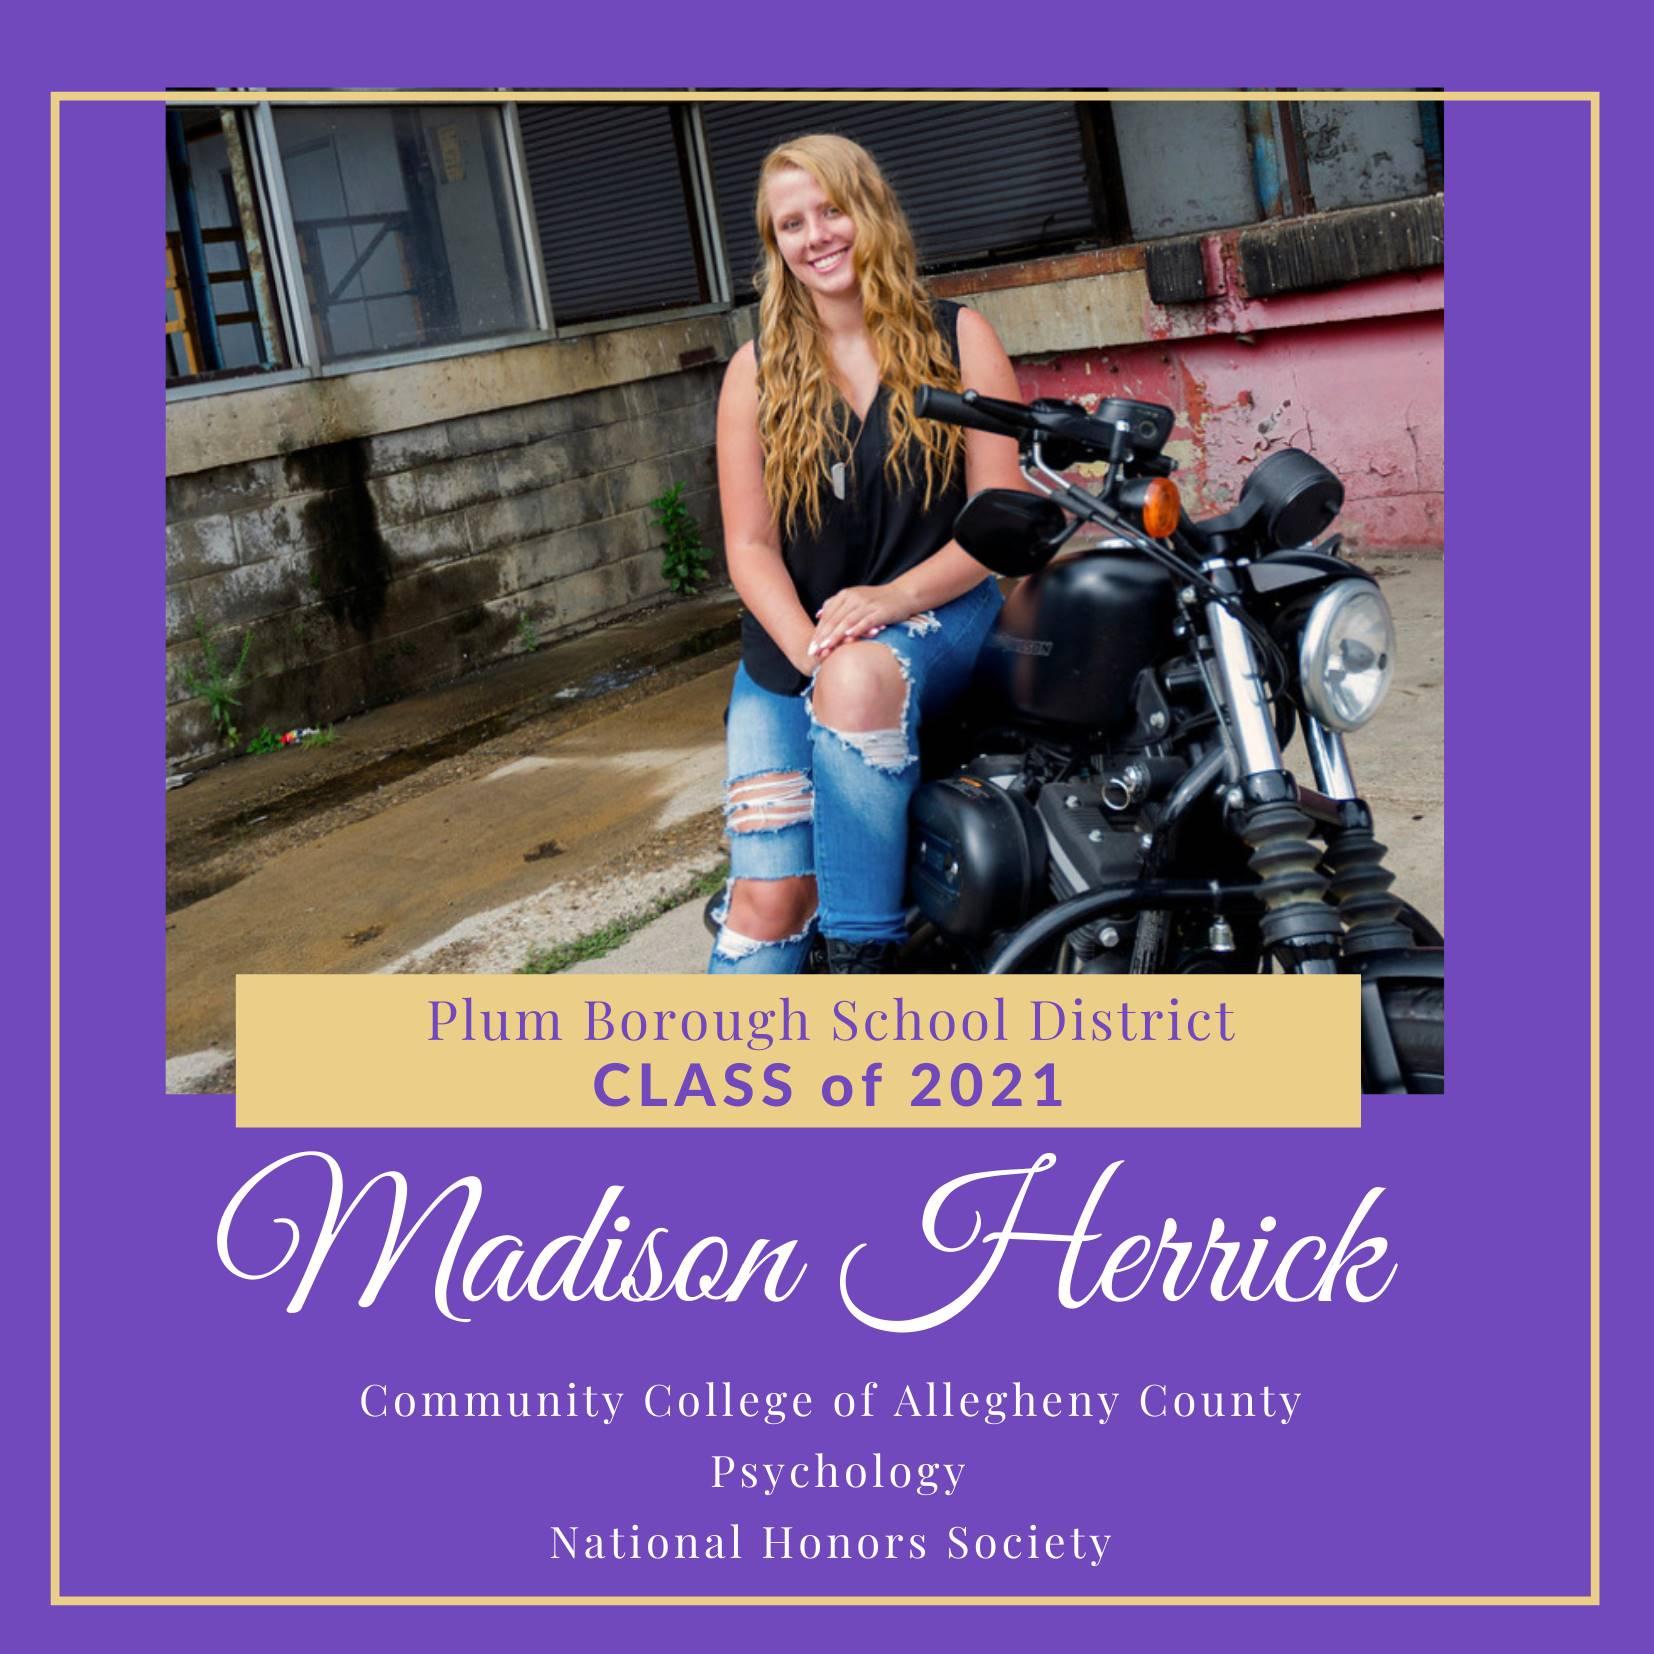 Congratulations to Madison Herrick, Class of 2021!